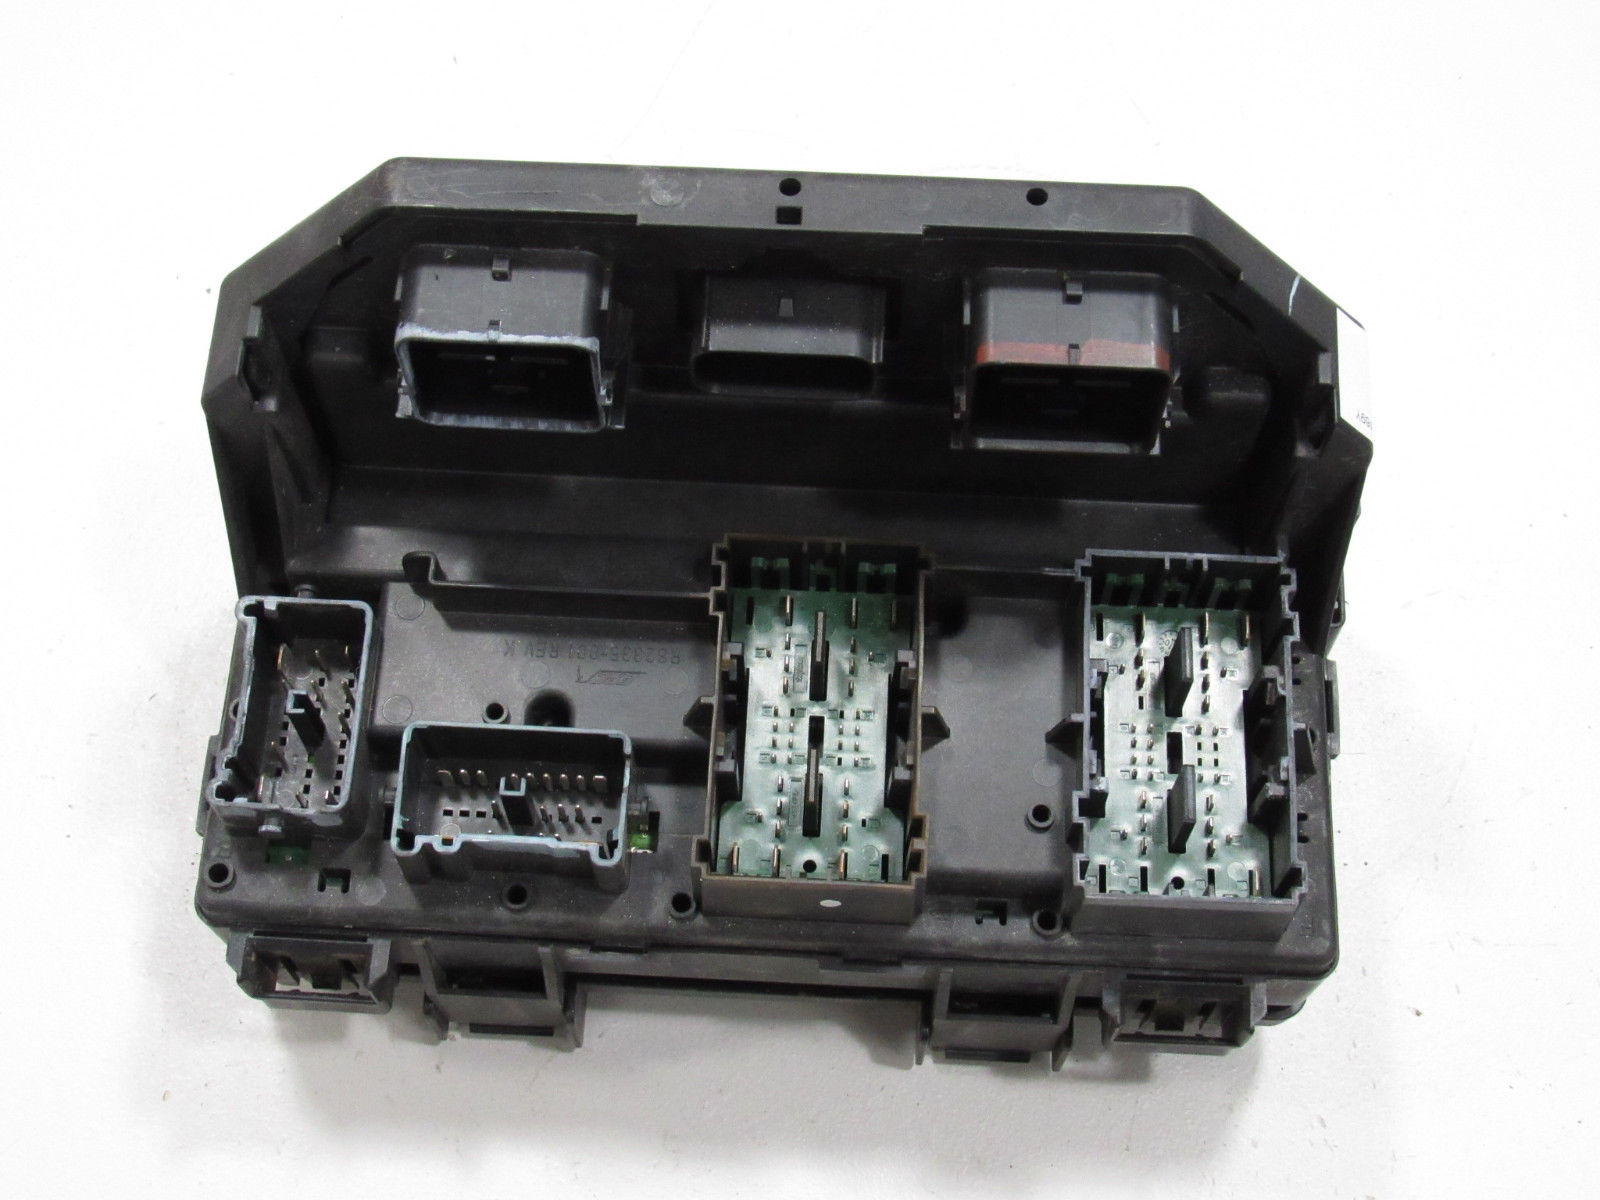 hight resolution of dodge nitro tipm totally integrated power body module fuse box al jpg 1600x1200 dodge nitro tipm